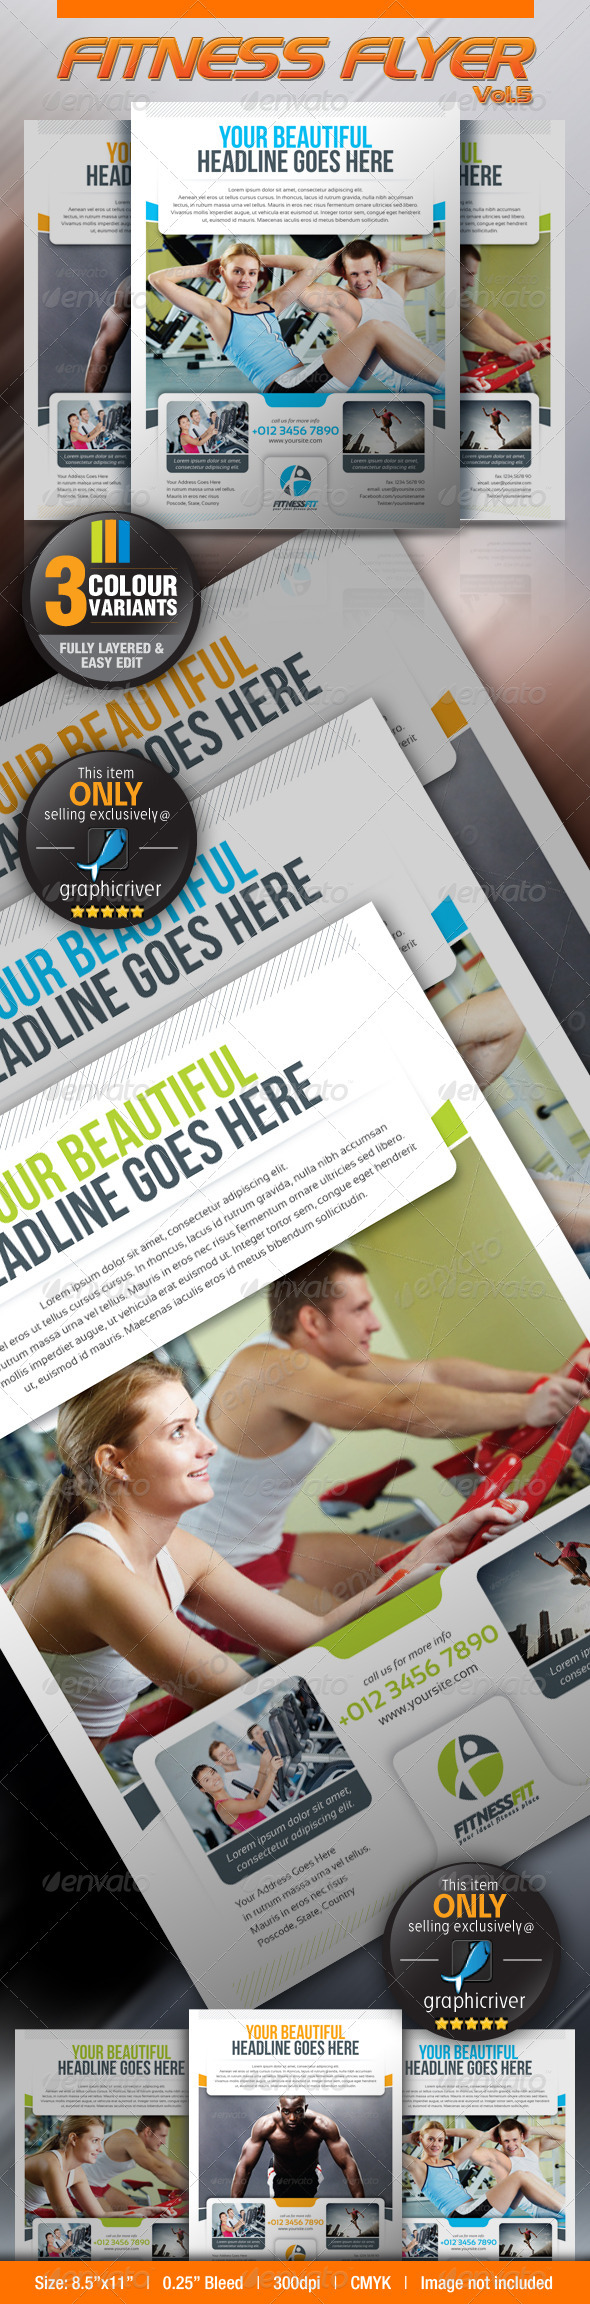 GraphicRiver Fitness Flyer Vol.5 3014206